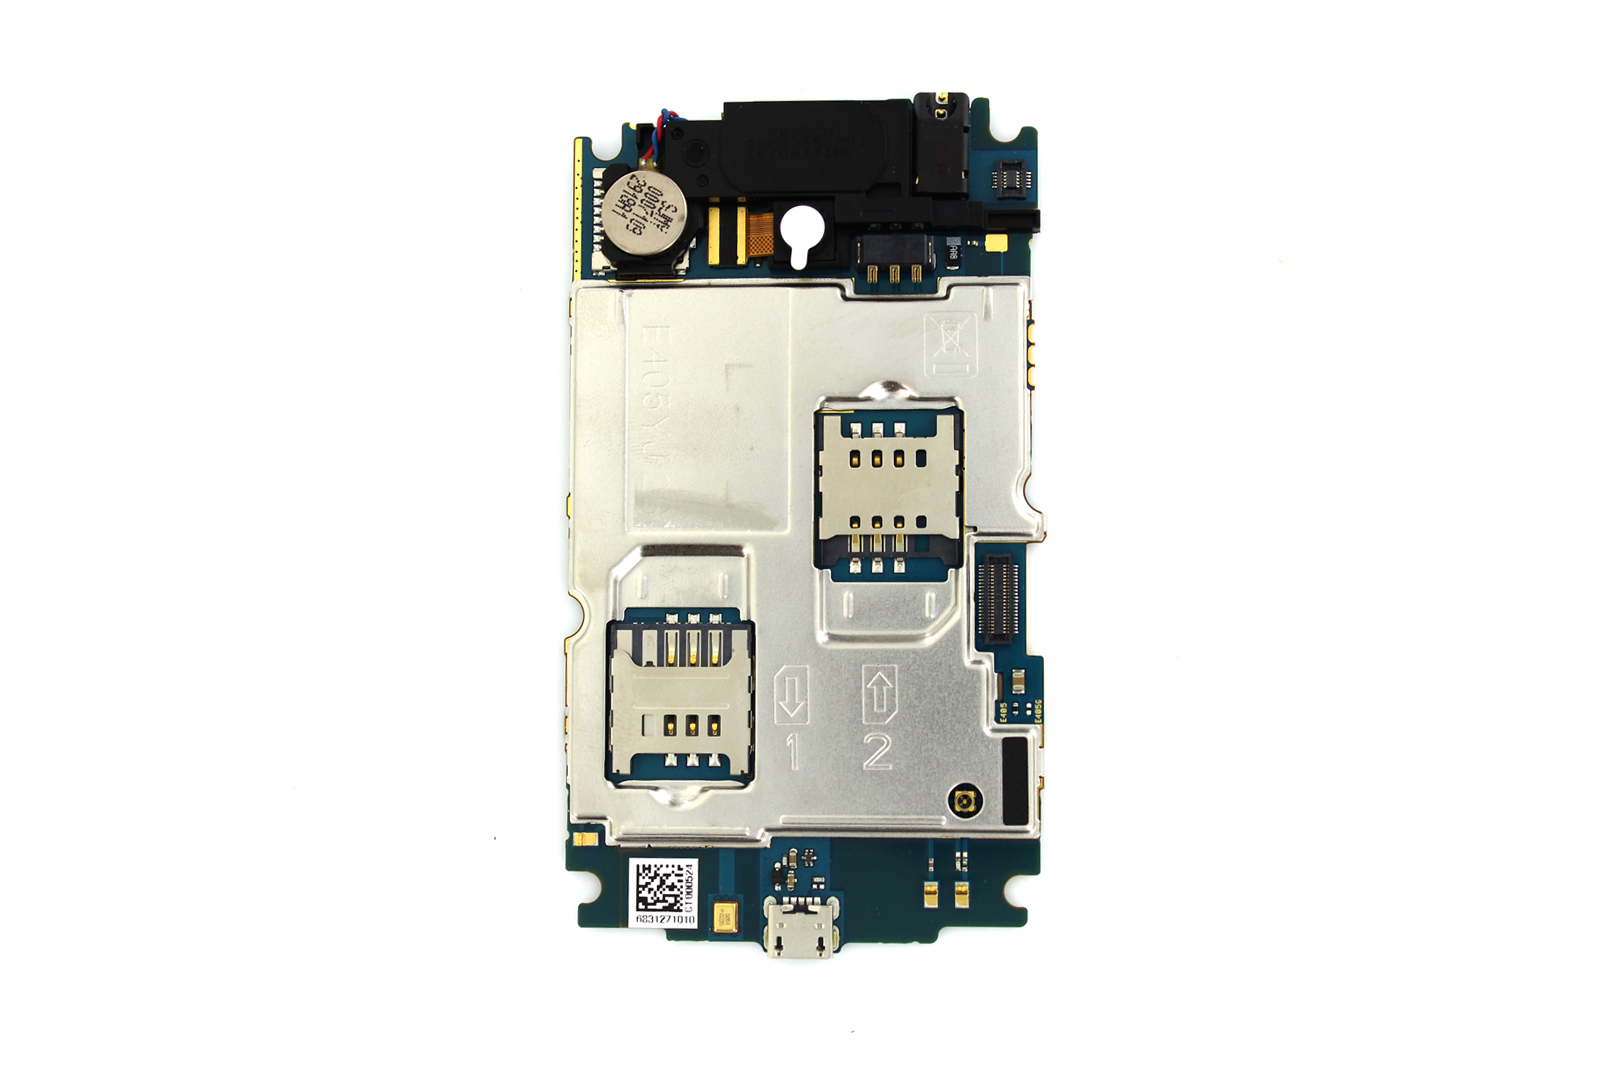 genuine lg optimus l3 e405 pcb motherboard with imei ebr75231419 rh ebay com LG L3 Specs LG Optimus L3 GSMArena